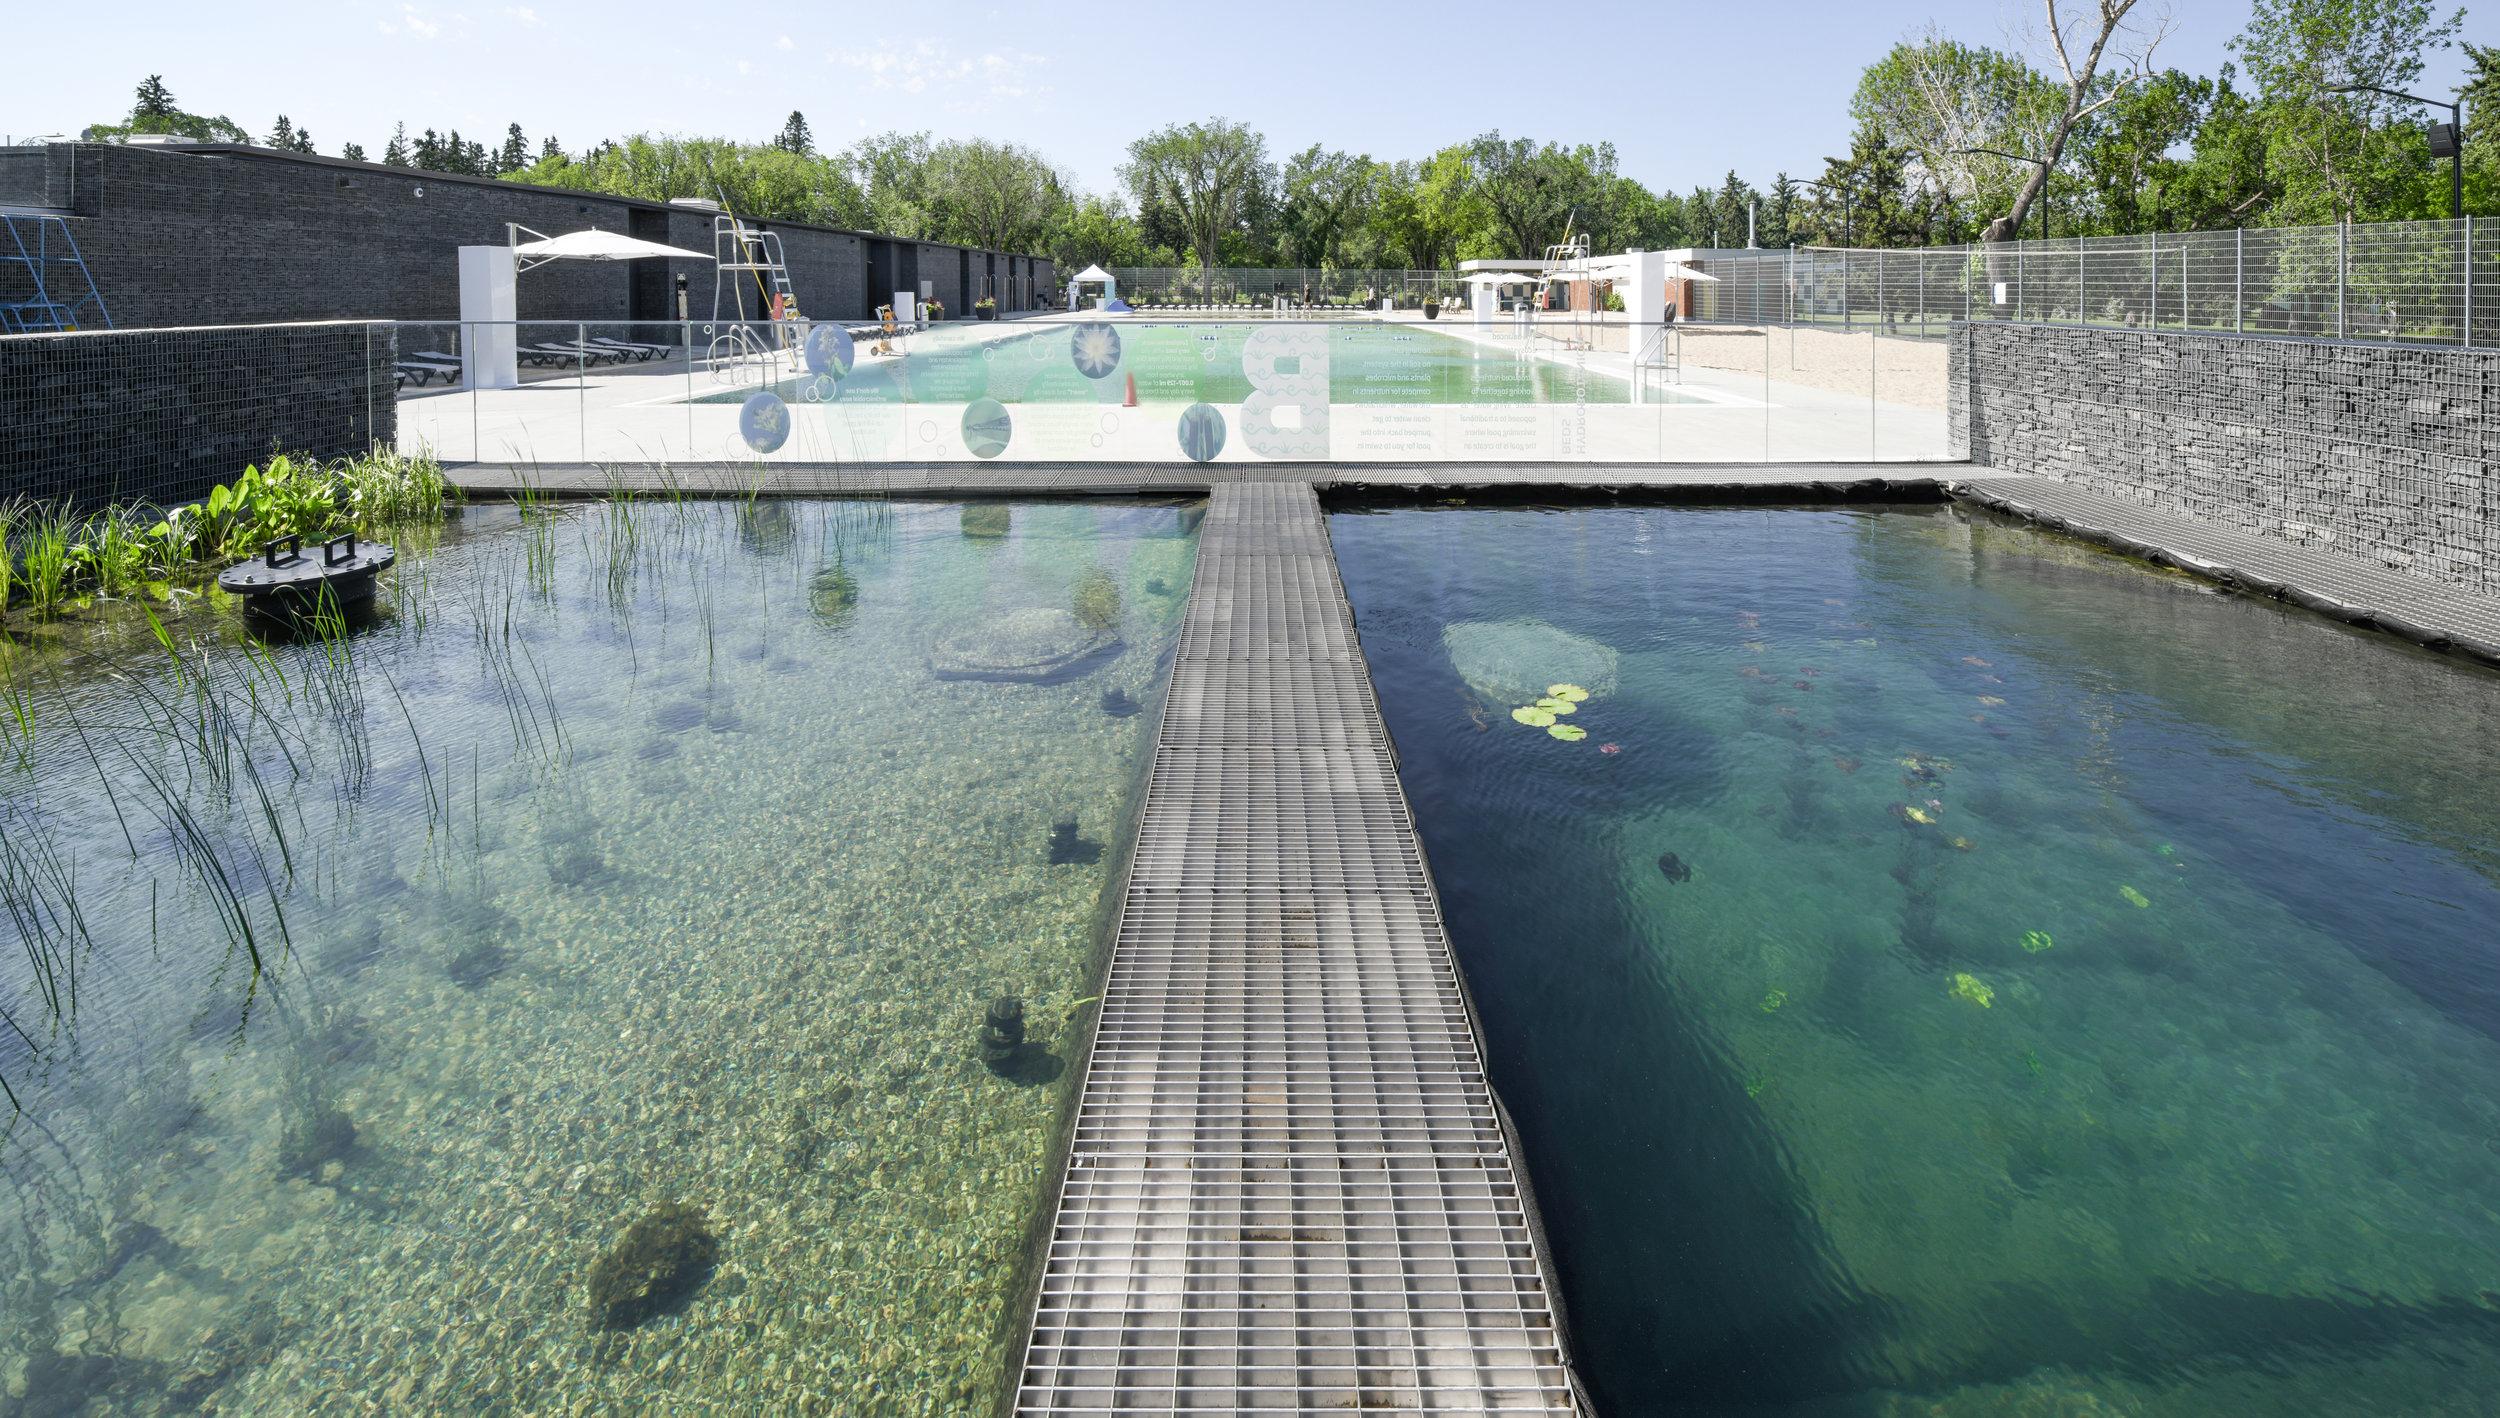 gh3 - Borden Park Natural Swimming Pool - Hydrobotanic Pond Pano